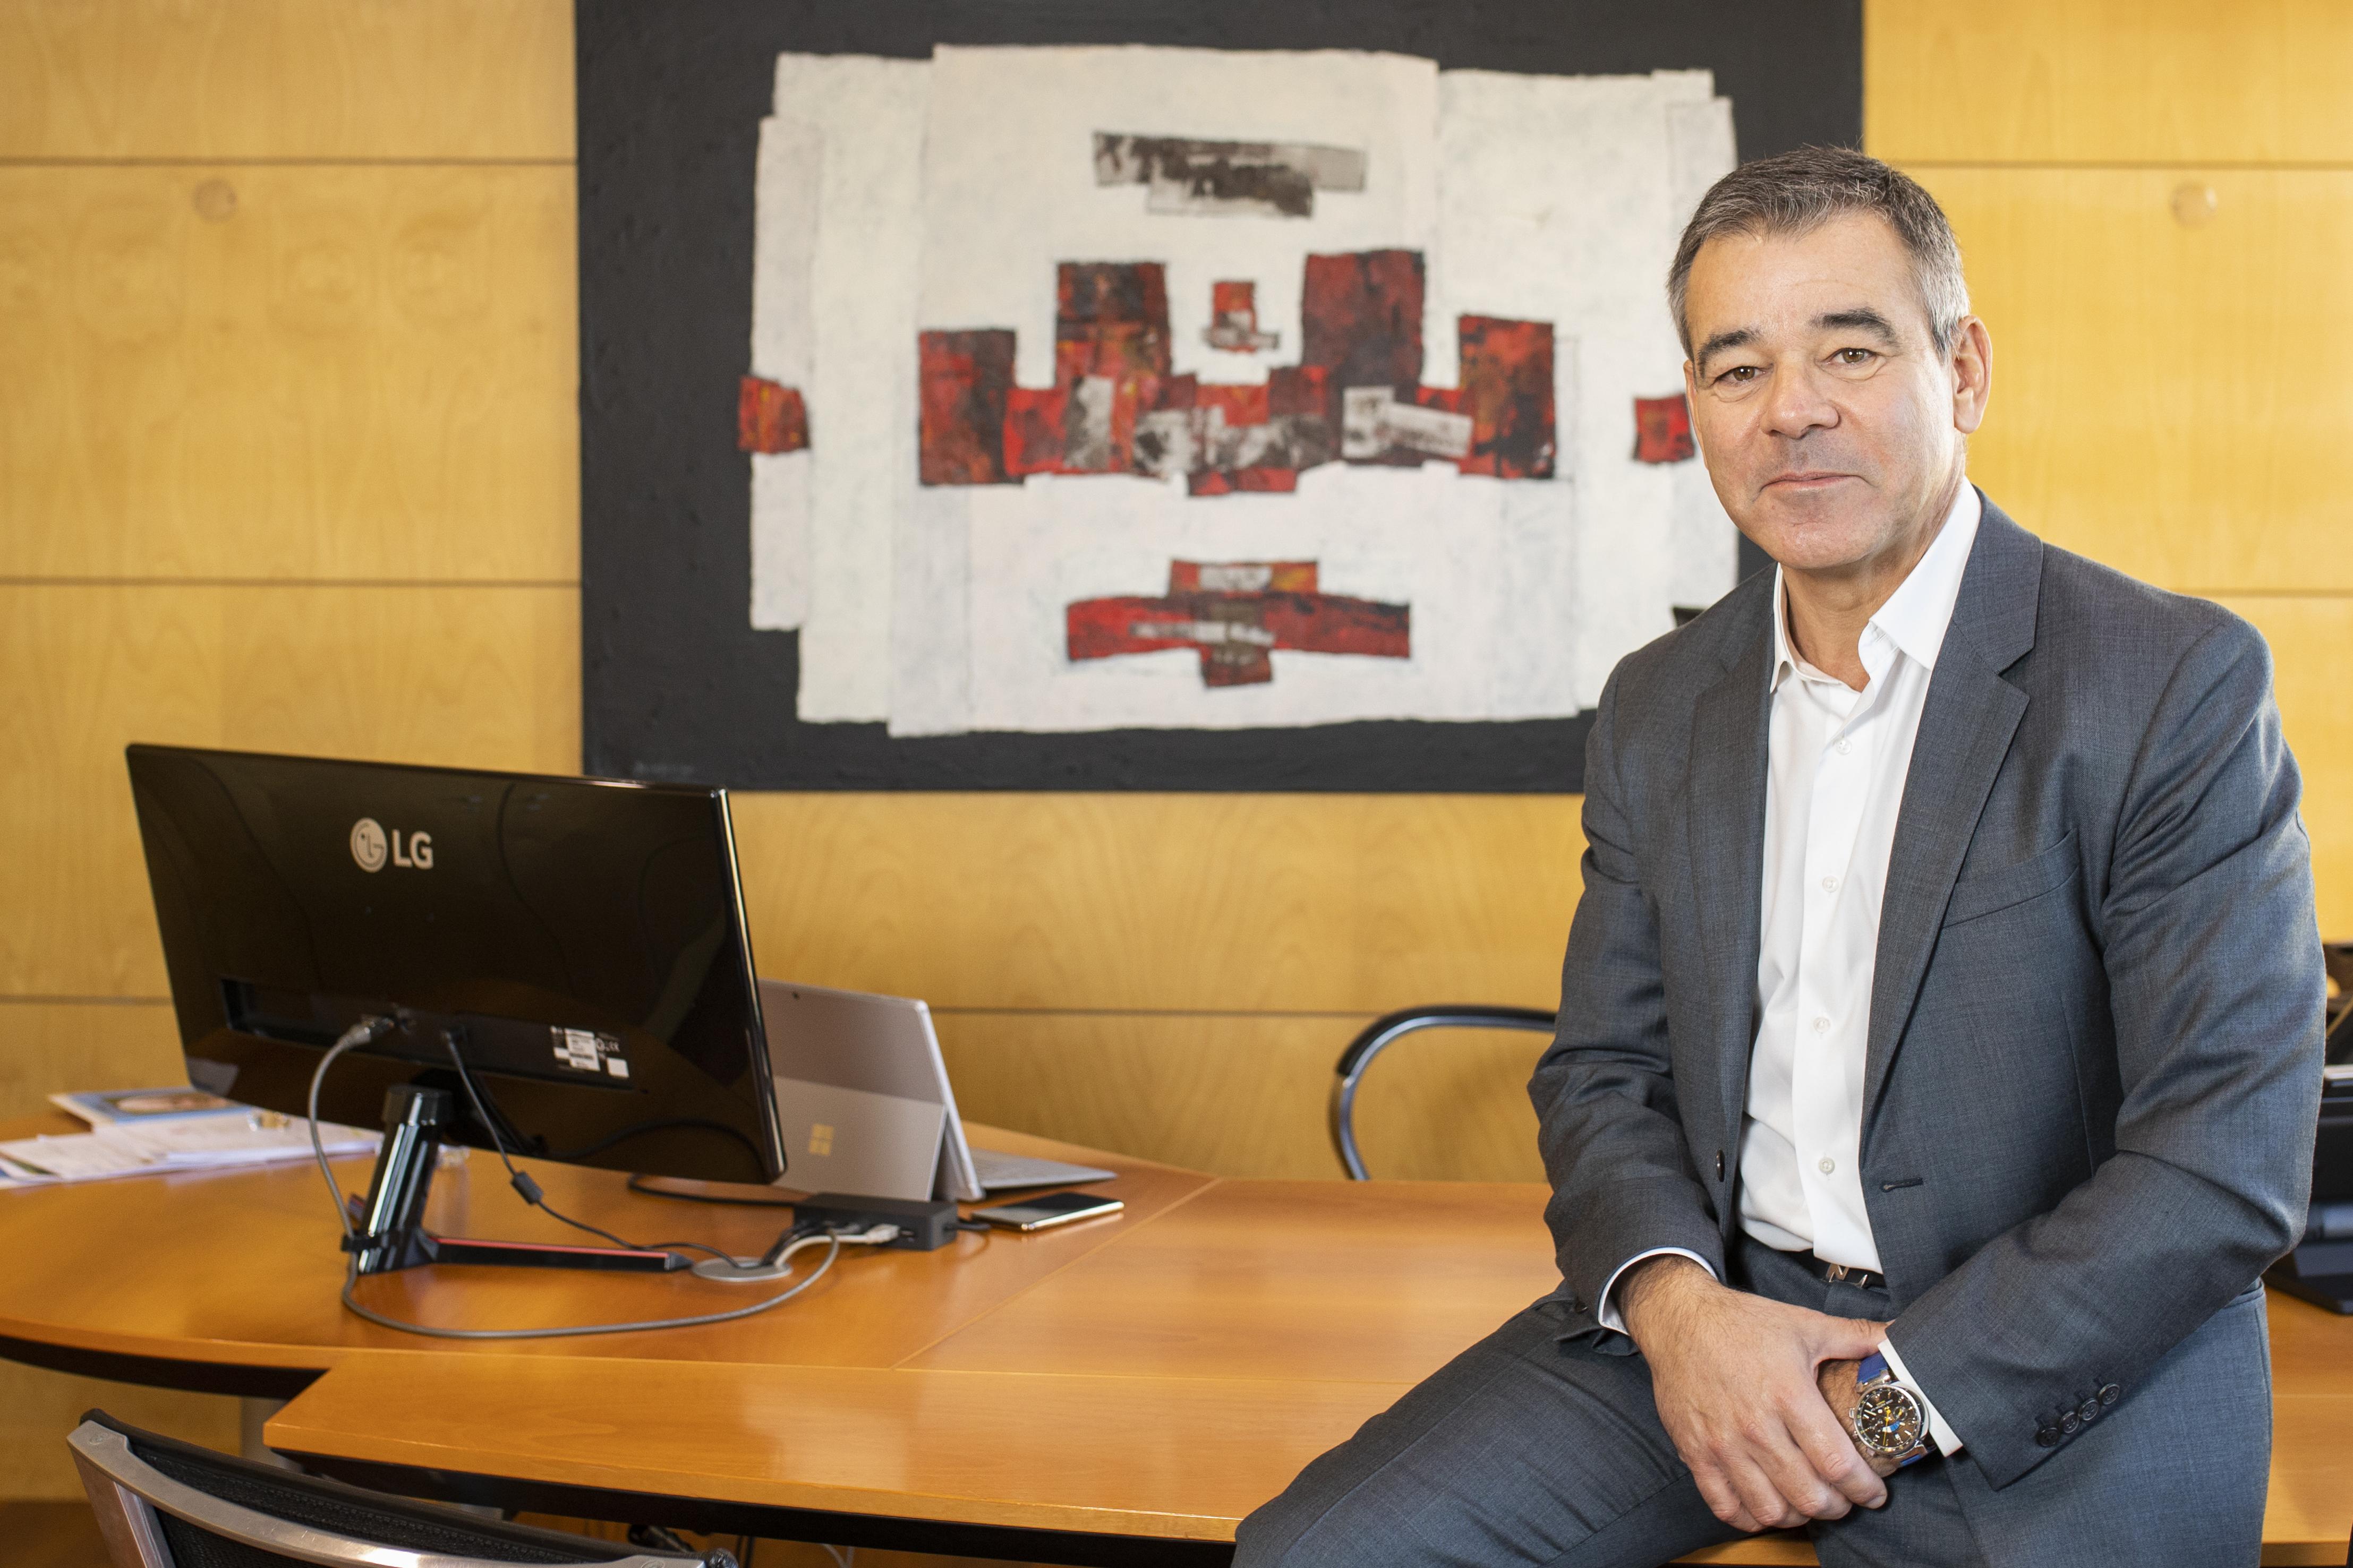 Sérgio Ferreira, CEO da Coporgest / Coporgest